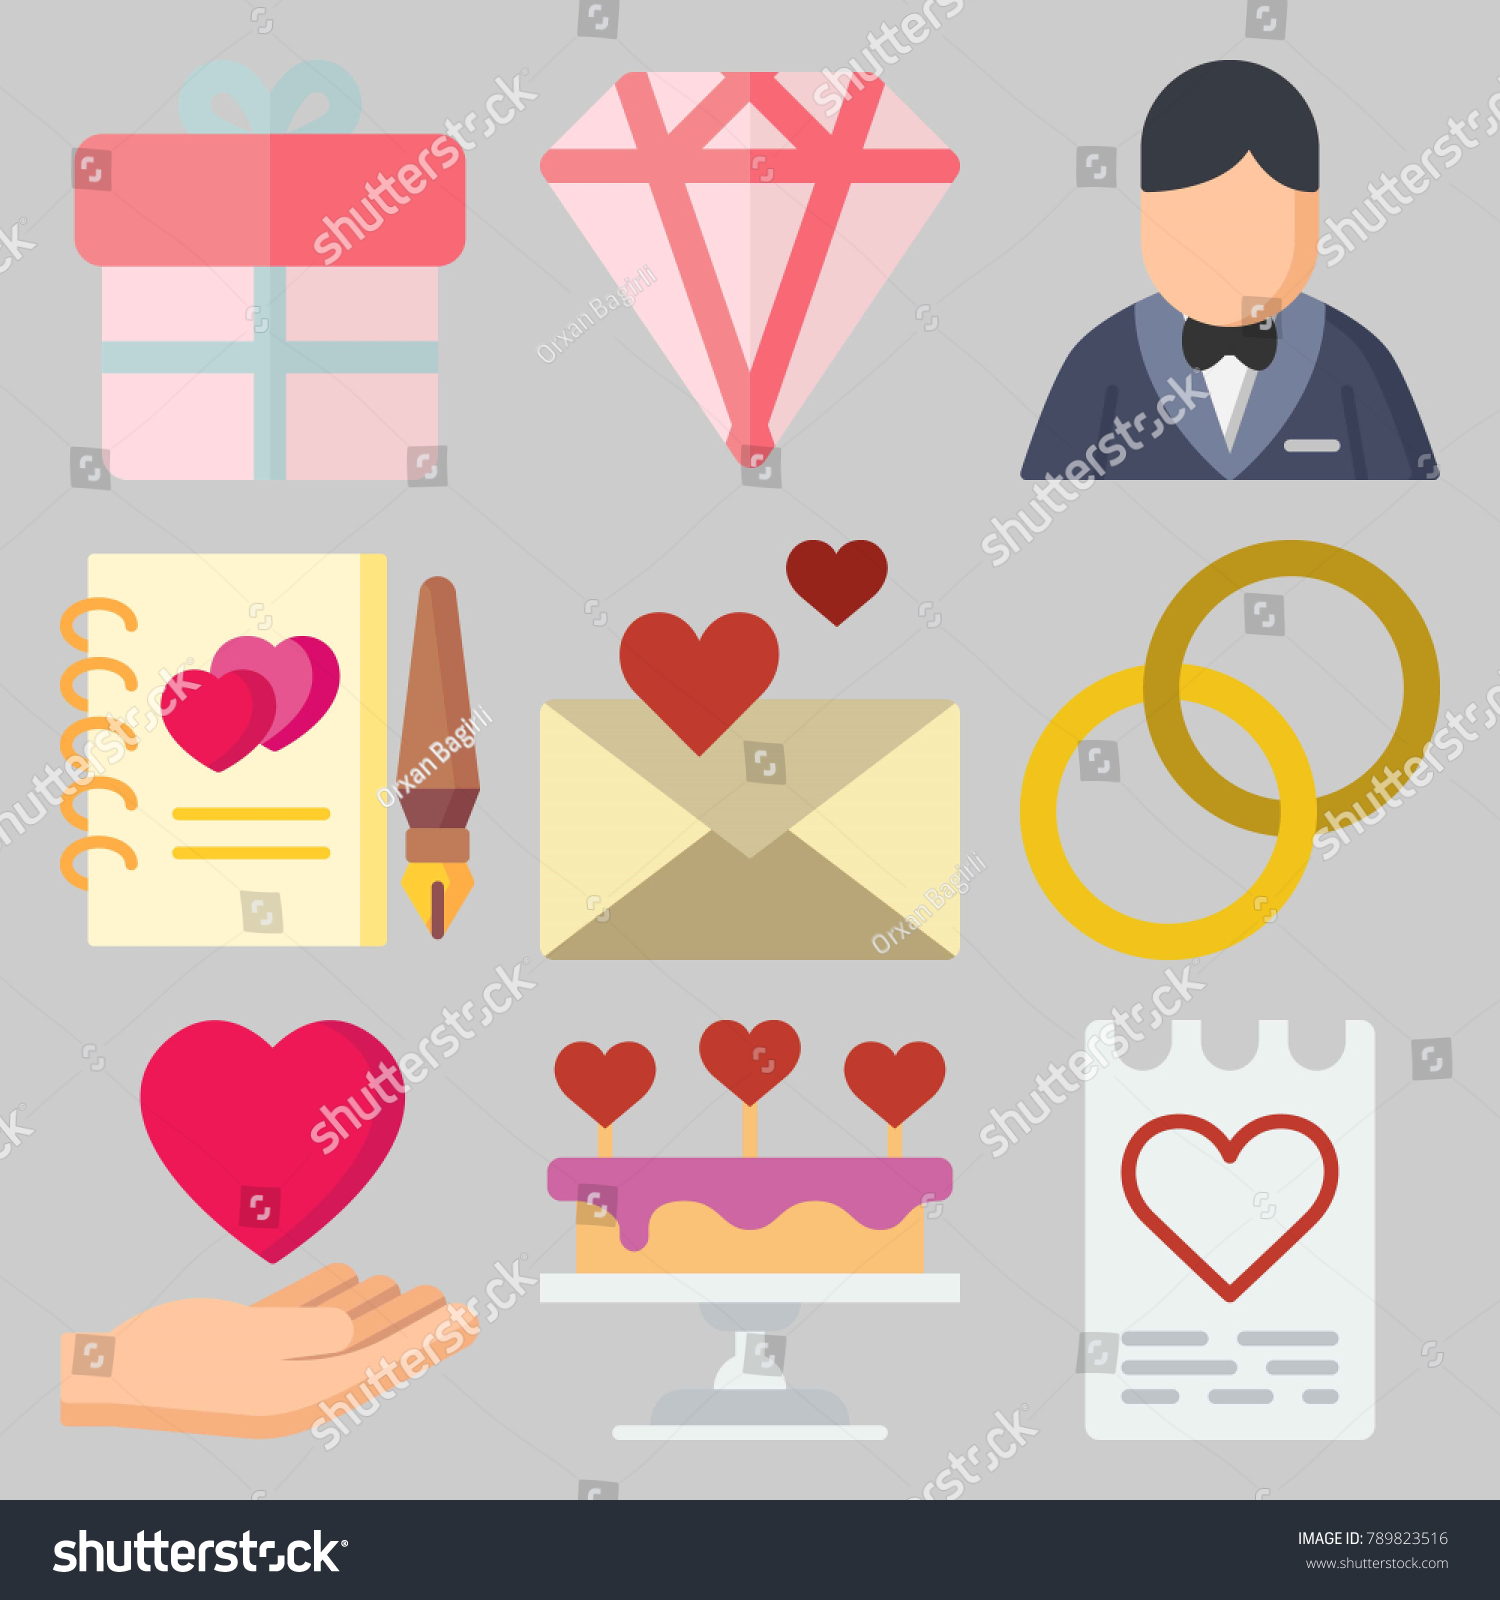 Icon Set About Wedding Keywords Groom Stock Vector 789823516 ...